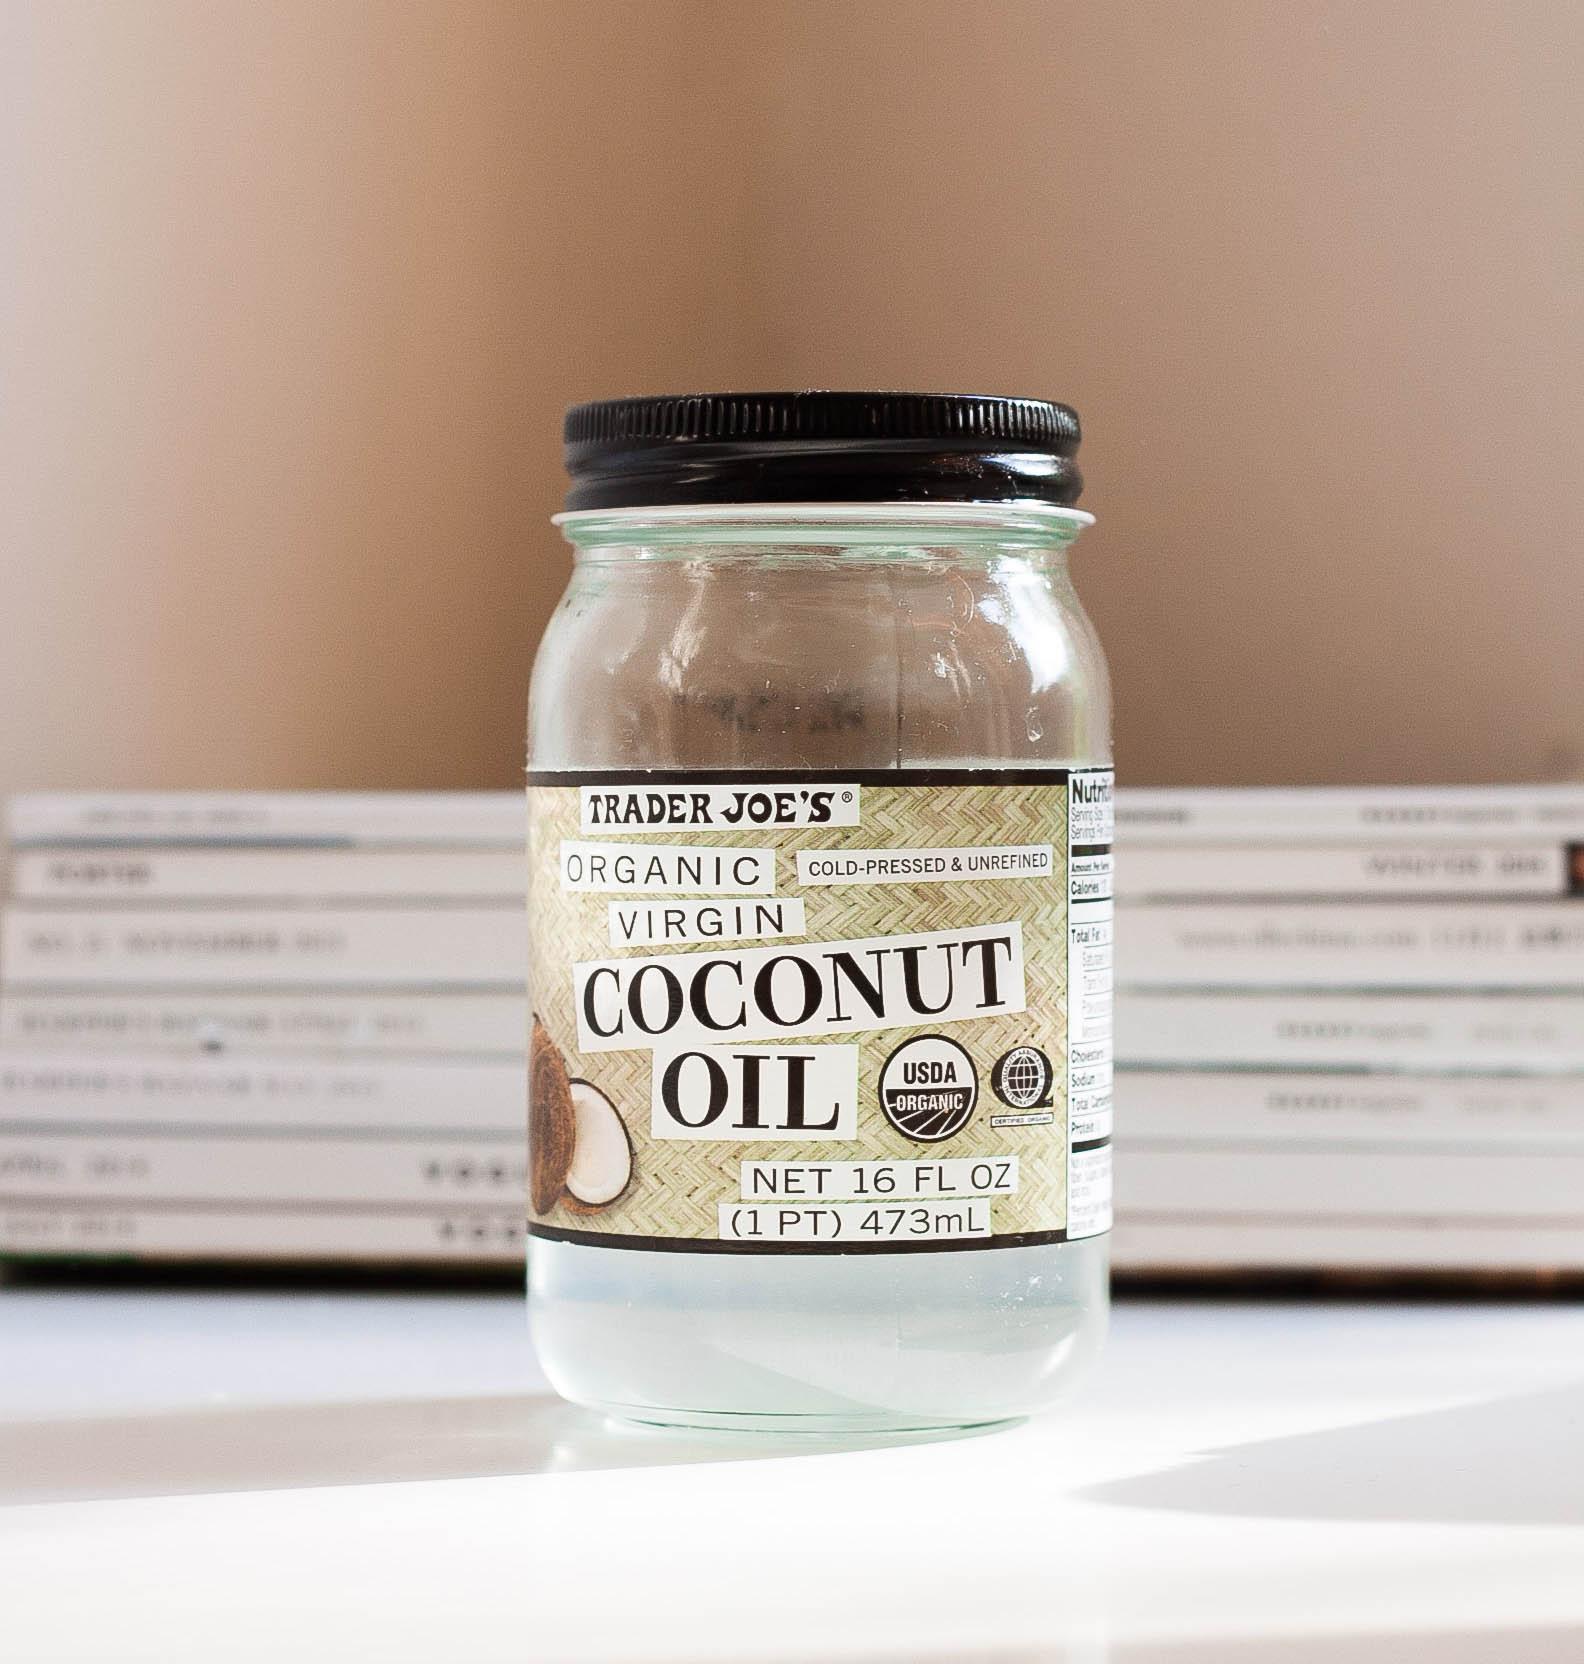 6 Benefits of Coconut Oil